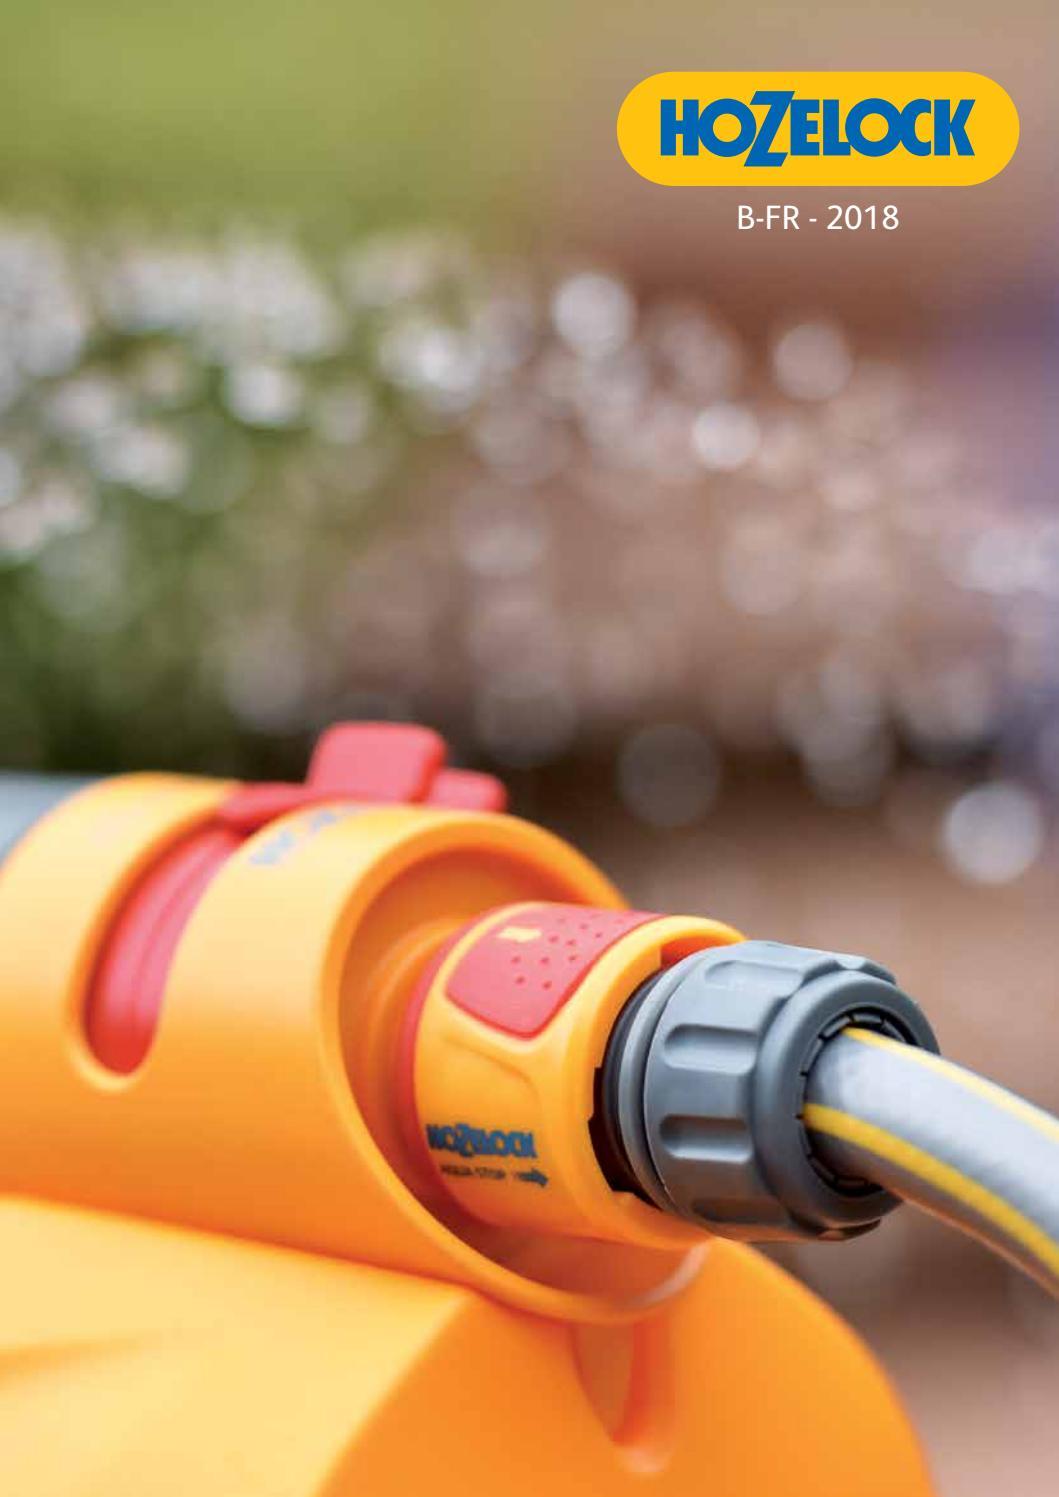 Hozelock easyclear 3000 filtre fontaine ROTOR DE POMPE Code:3418